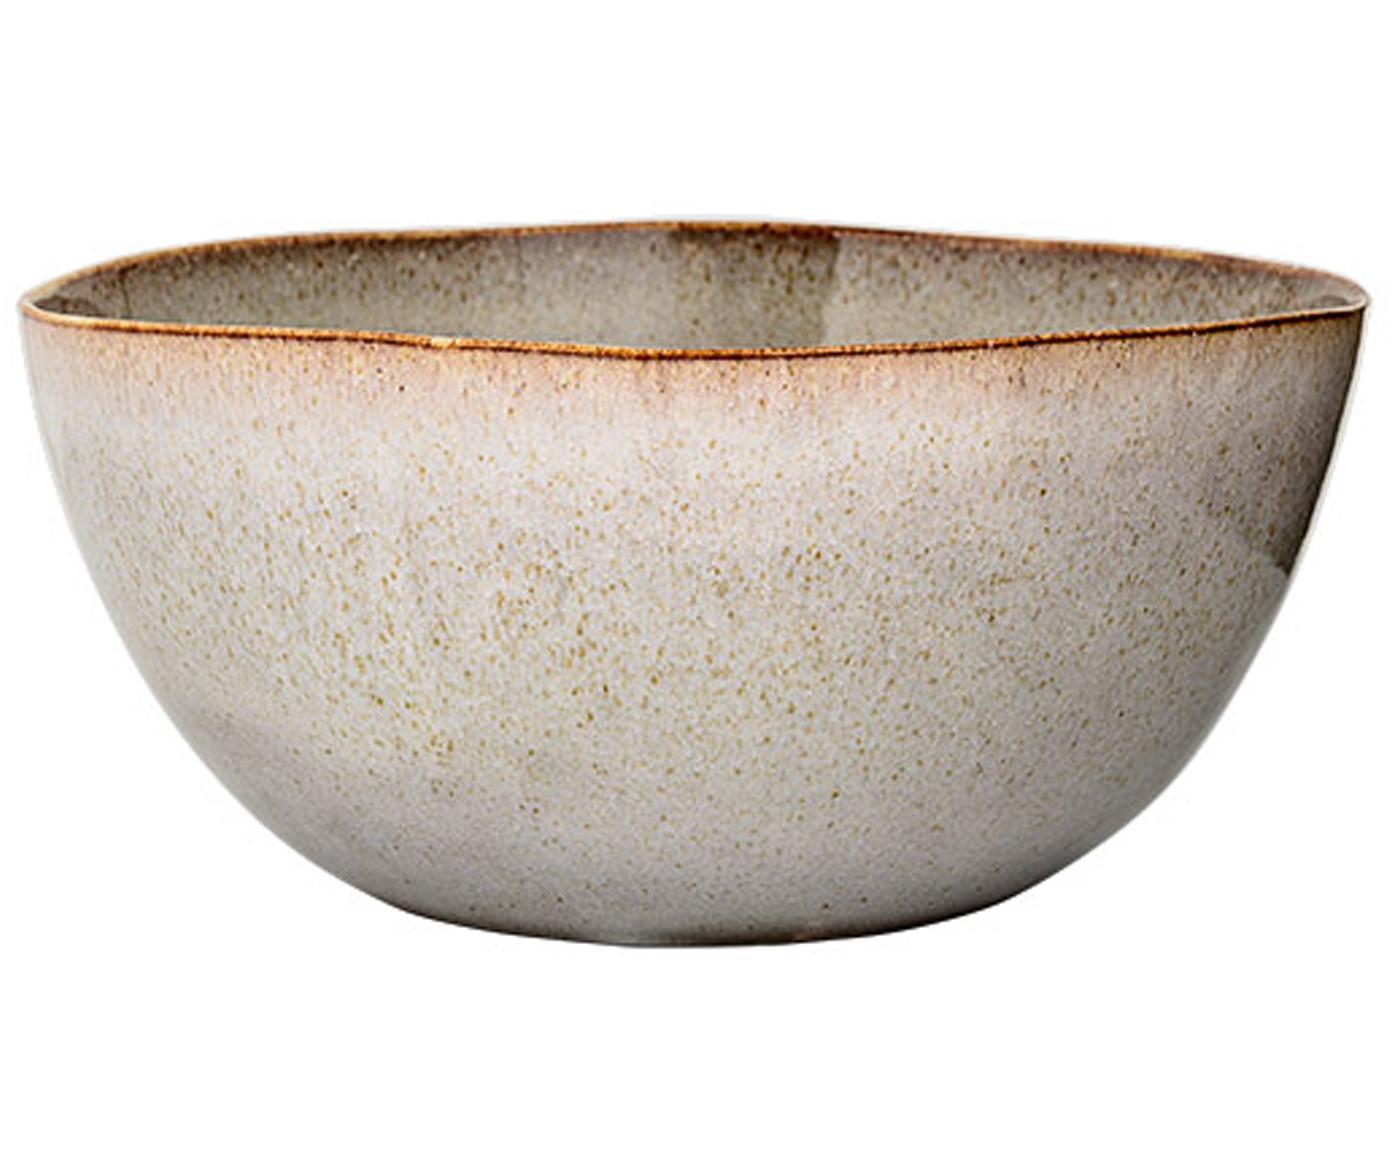 Ciotola centrotavola fatta a mano Sandrine, Ceramica, Seduta: grigio chiaro, macchiato Struttura: nero opaco, Ø 26 x Alt. 17 cm